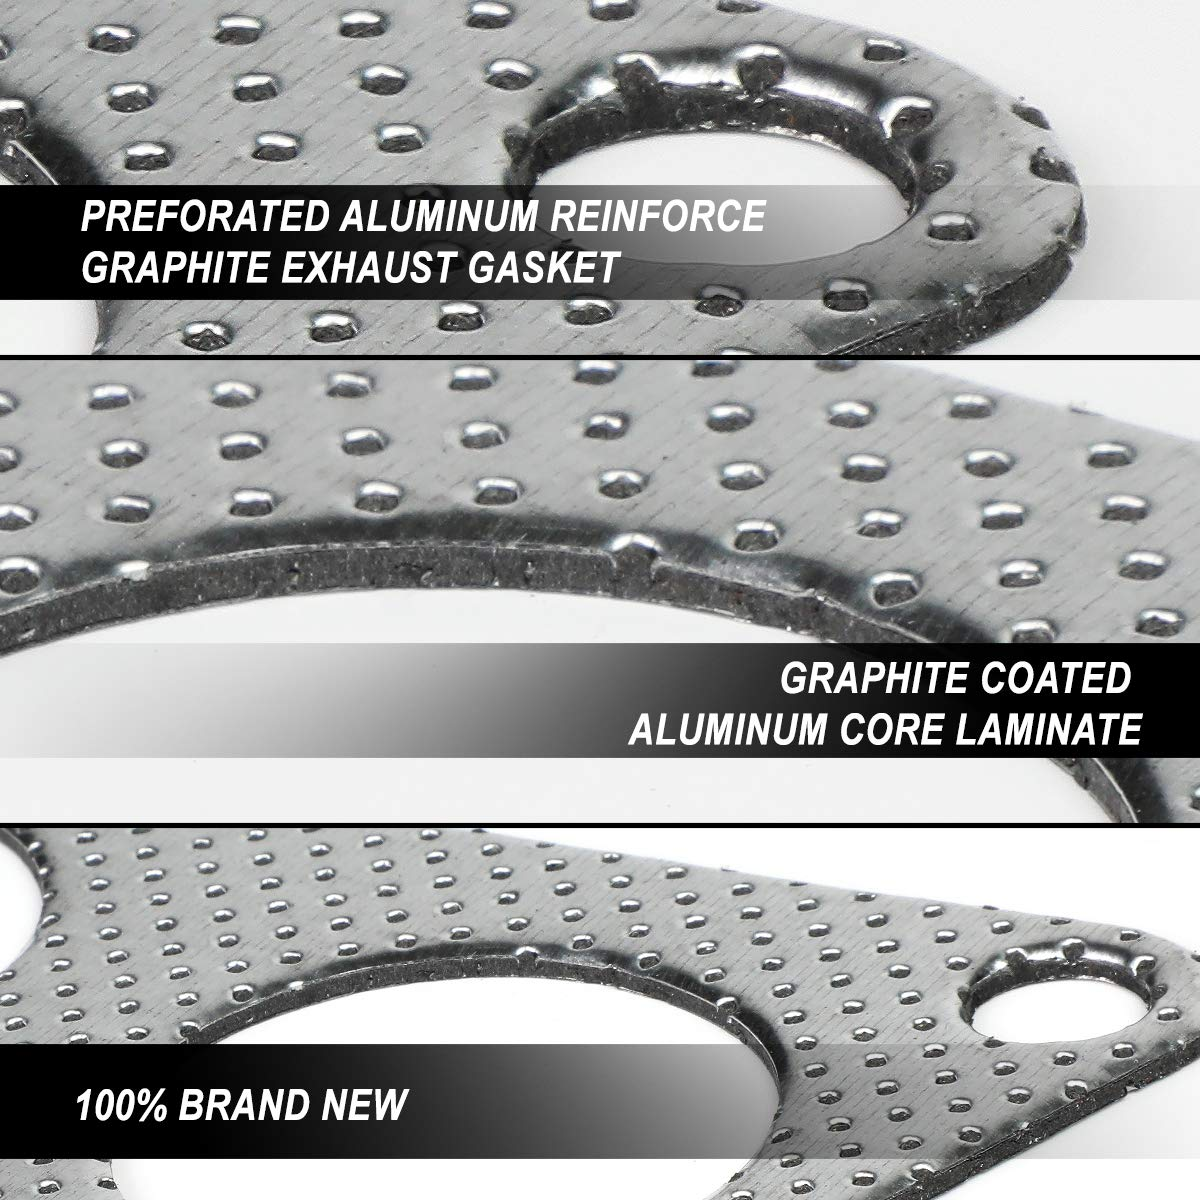 Aluminum Exhaust Manifold Header Gasket Set for 13-19 Scion FRS Toyota 86 Subaru BRZ 2.0L